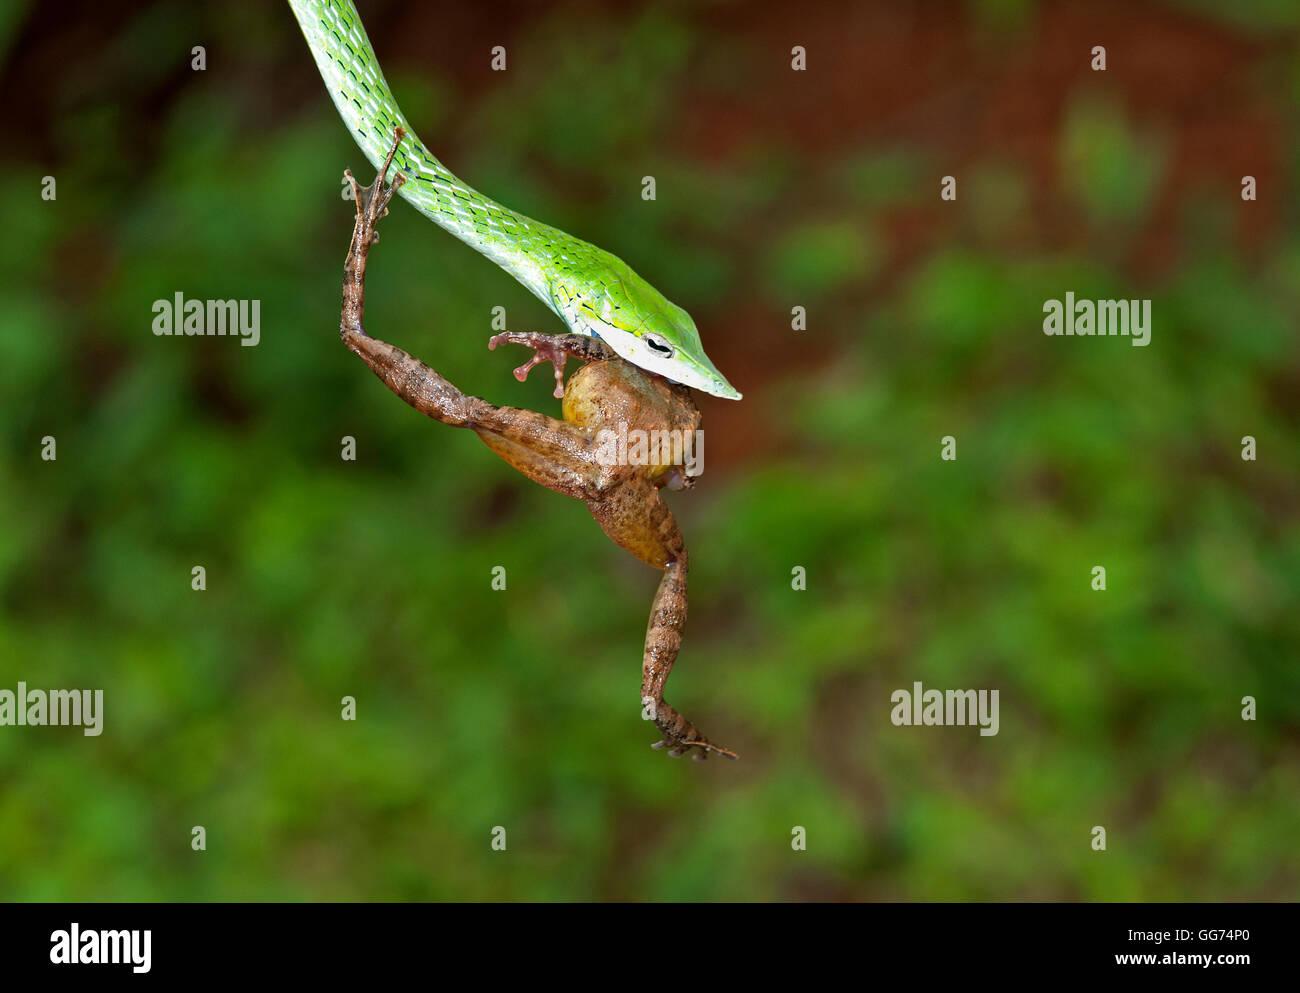 L'image de vert serpent( Hierophis viridiflavus Whip) avec Kill frog à matheran, Mumbai, Inde Banque D'Images